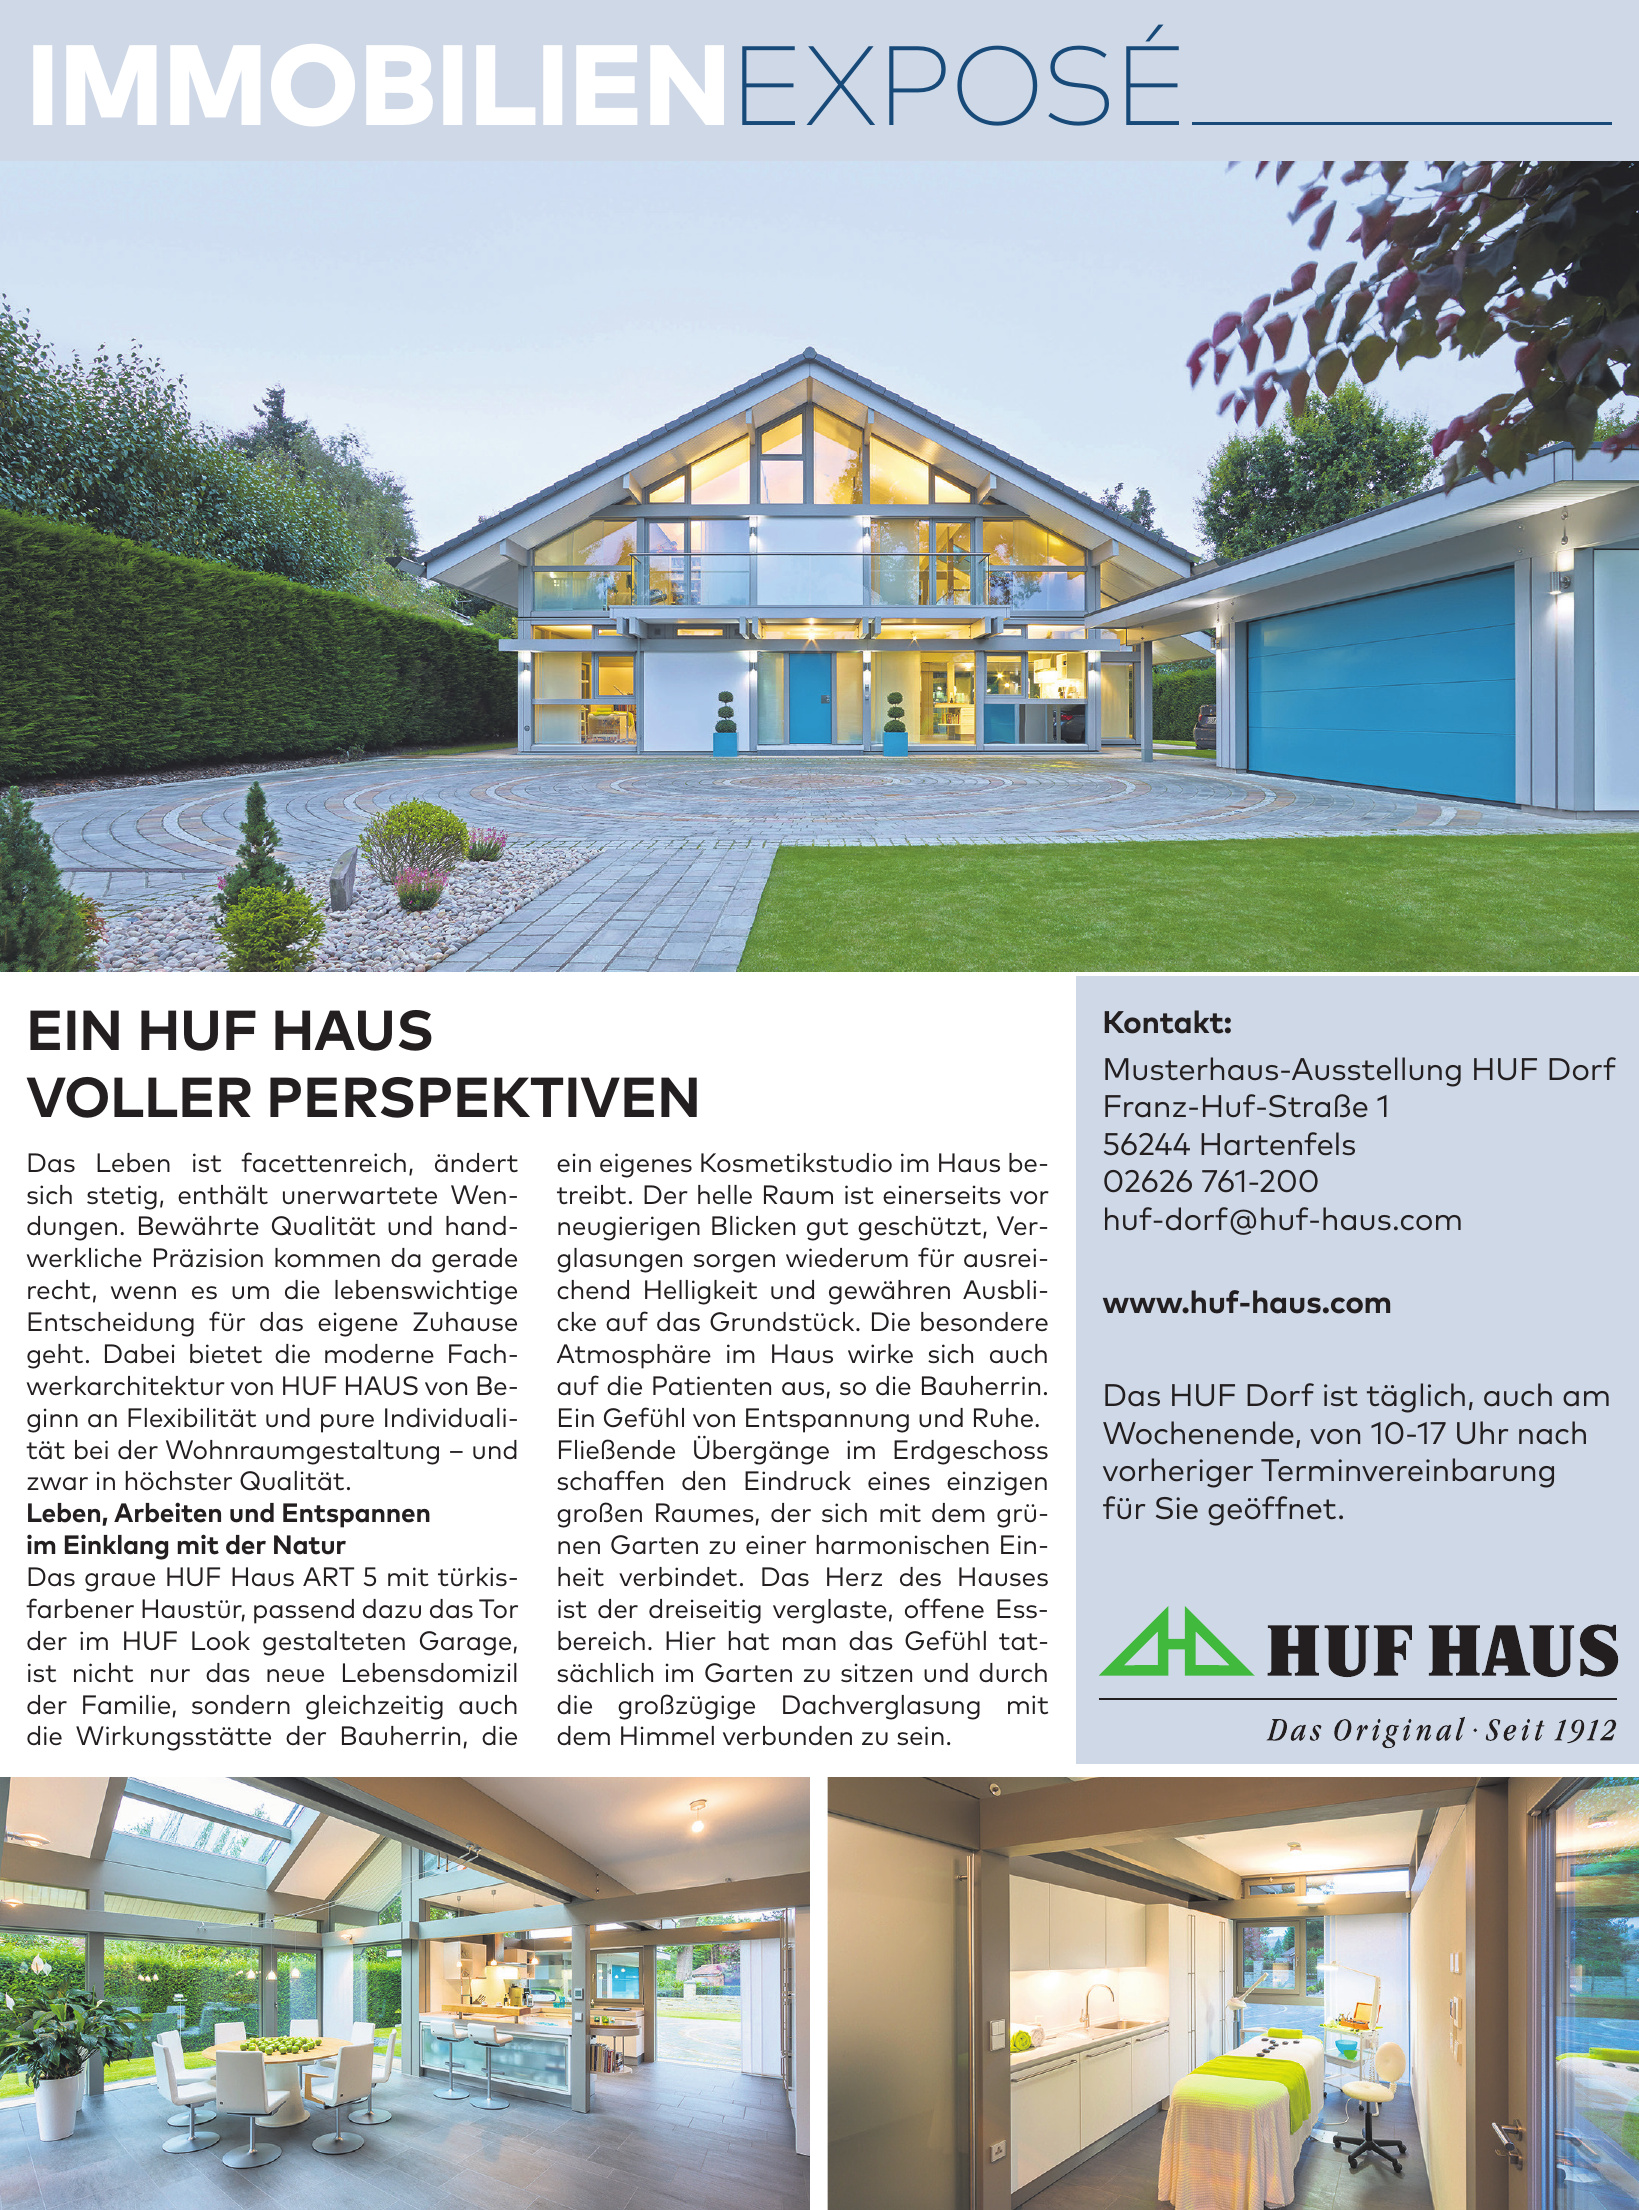 Musterhaus-Ausstellung HUF Dorf